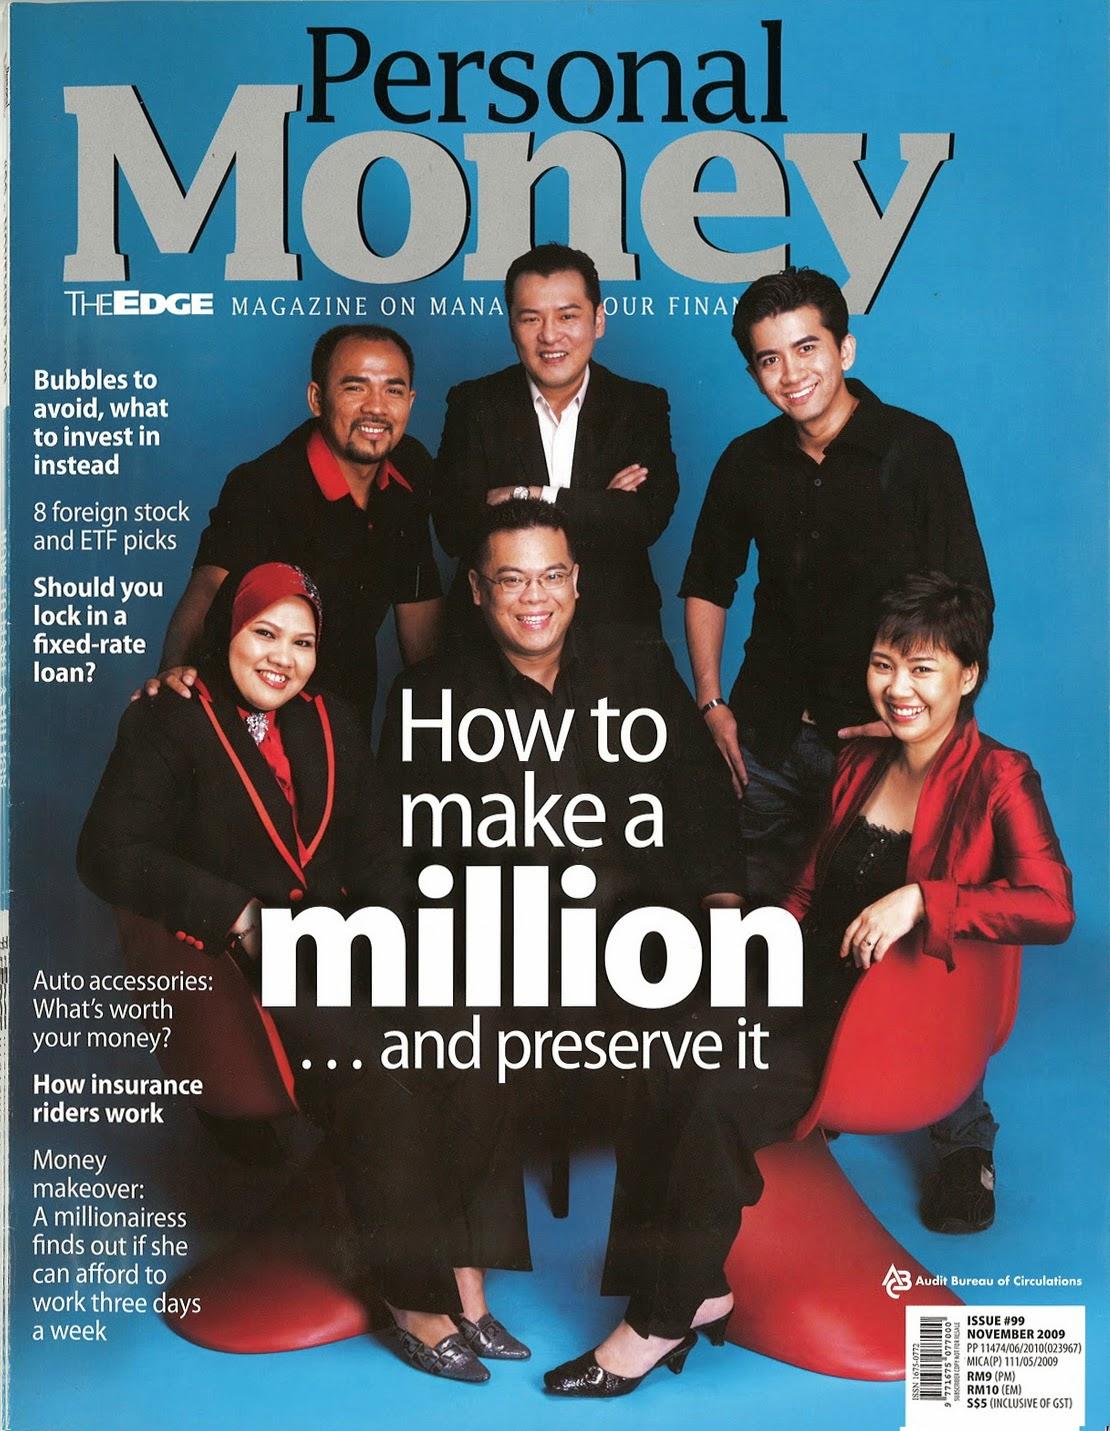 PERSONAL MONEY NOVEMBER 2009